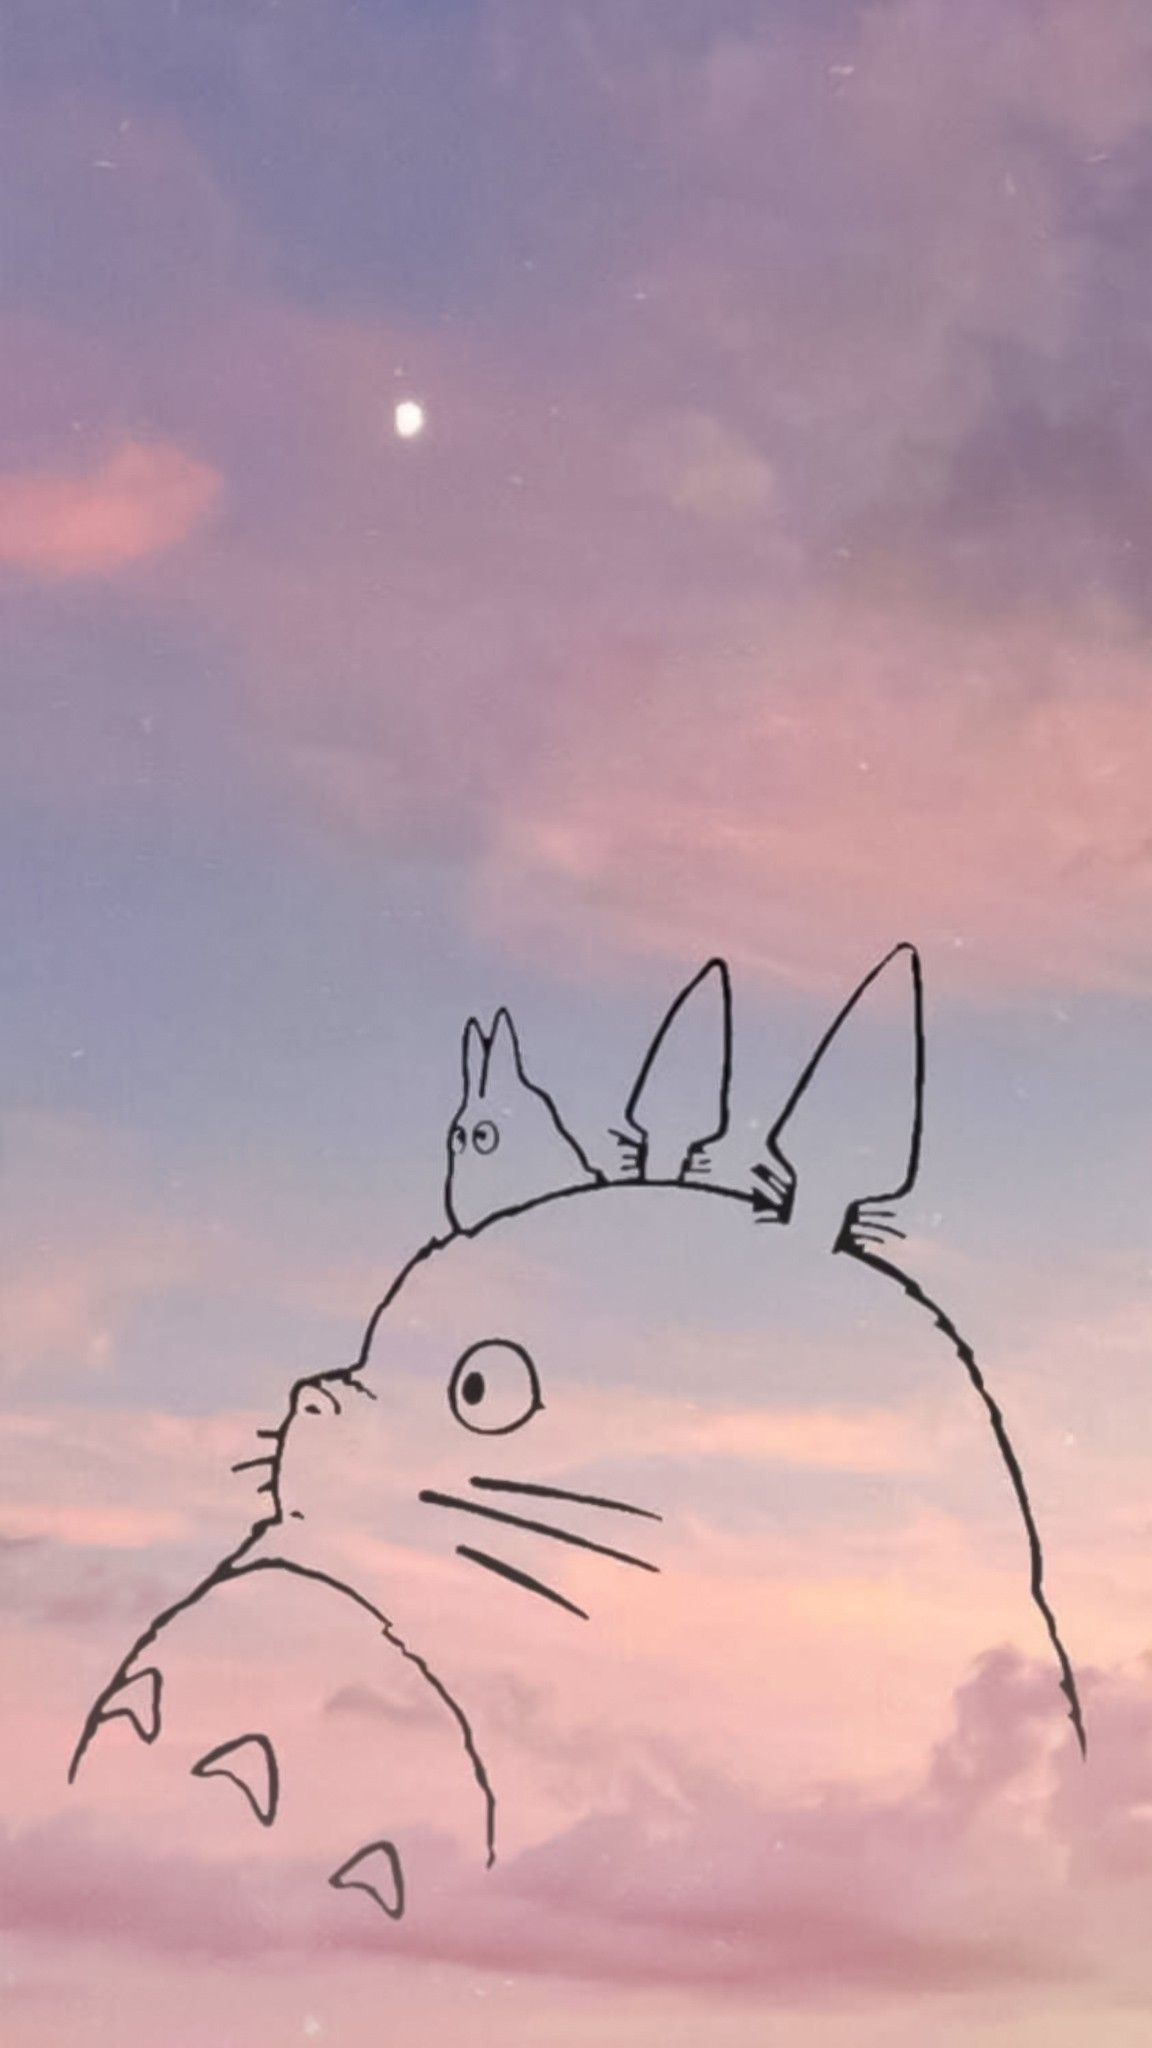 Pin De Apple Tea Em ジブリ Em 2020 Studio Ghibli Ghibli Filmes Studio Ghibli